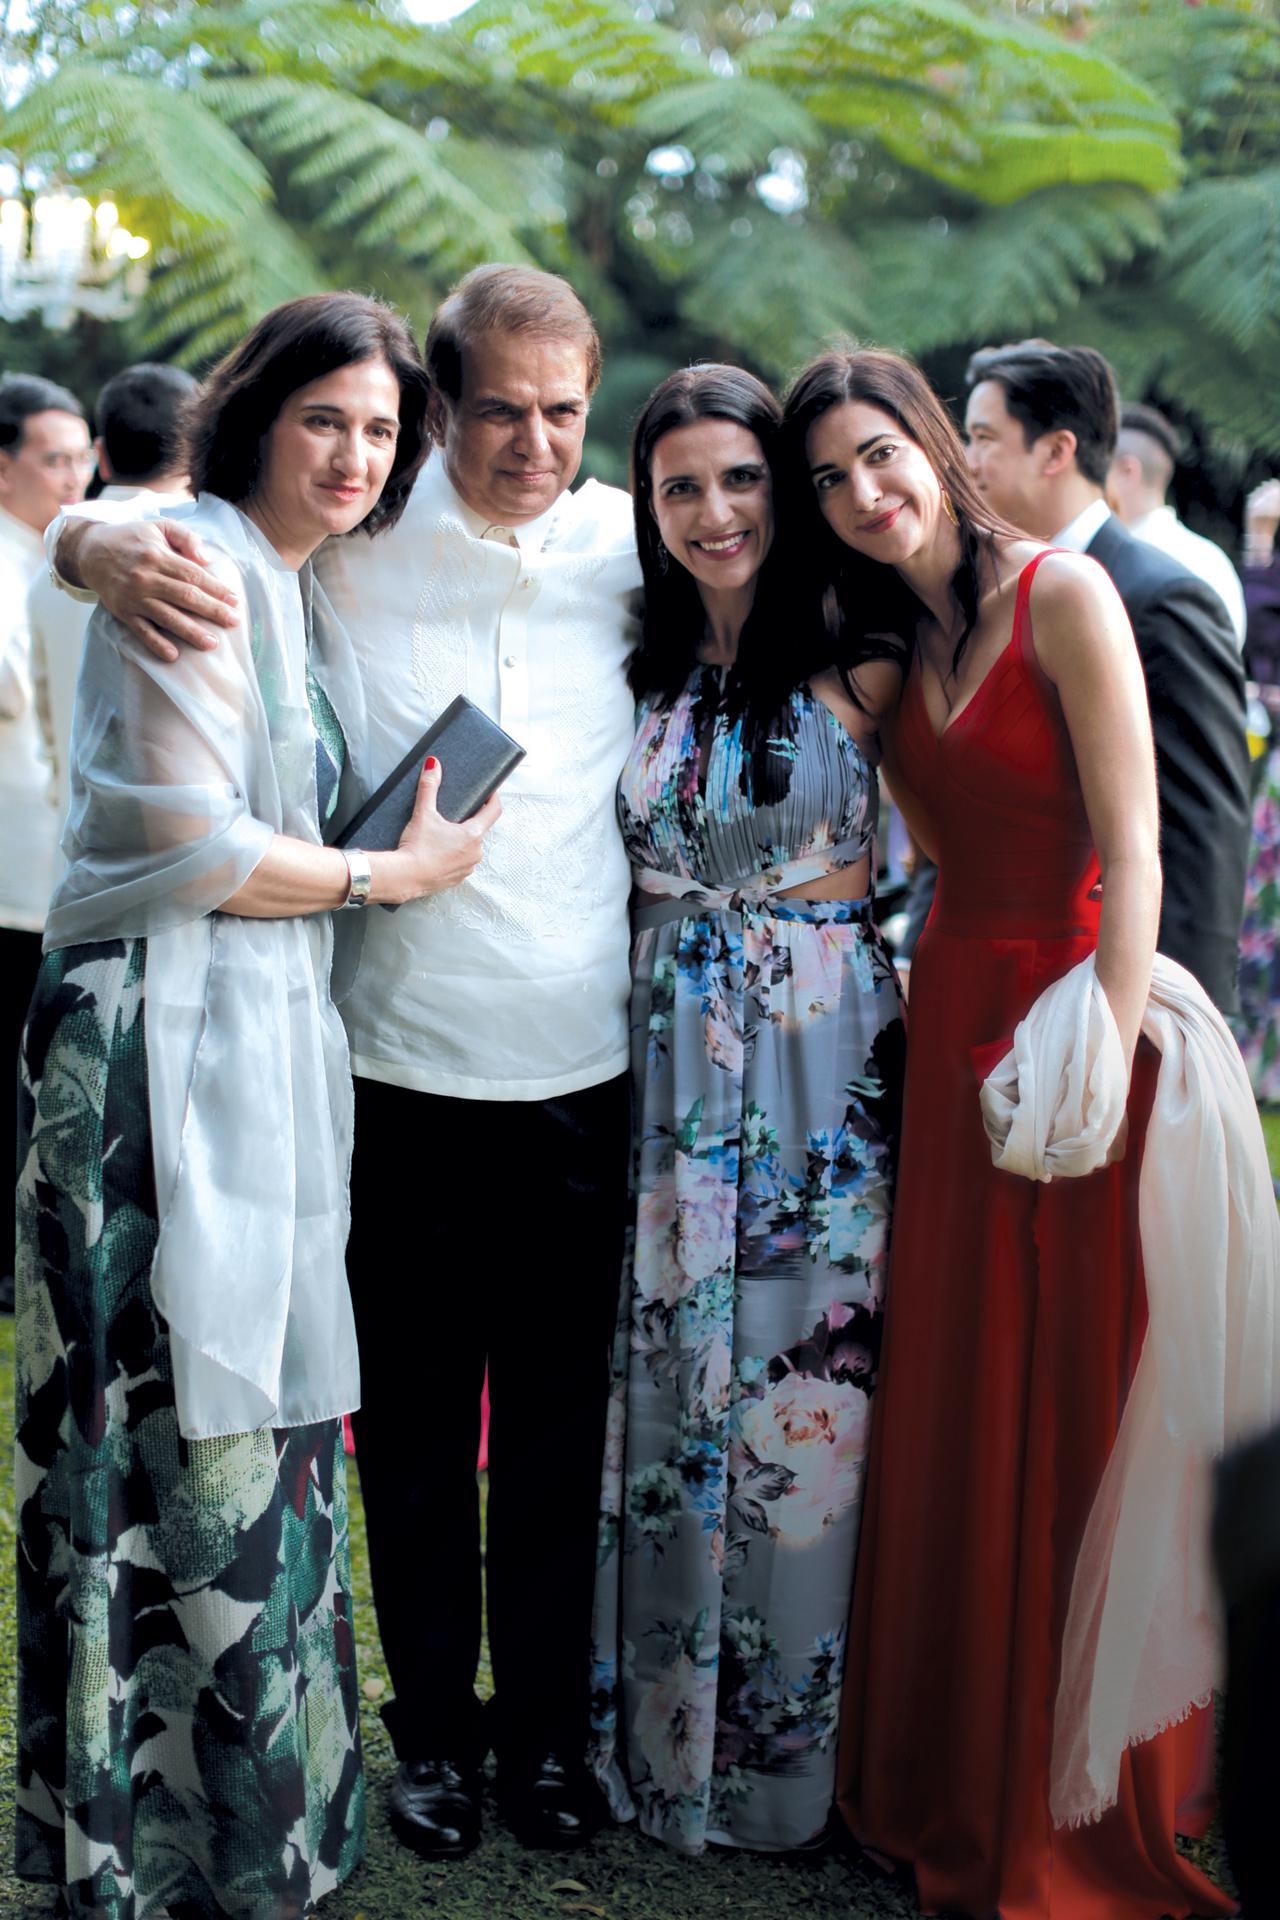 Patricia Rincon Olbes, Rene Ros Olbes, Virginia Rincon Olbes, Loreta Rincon Olbes